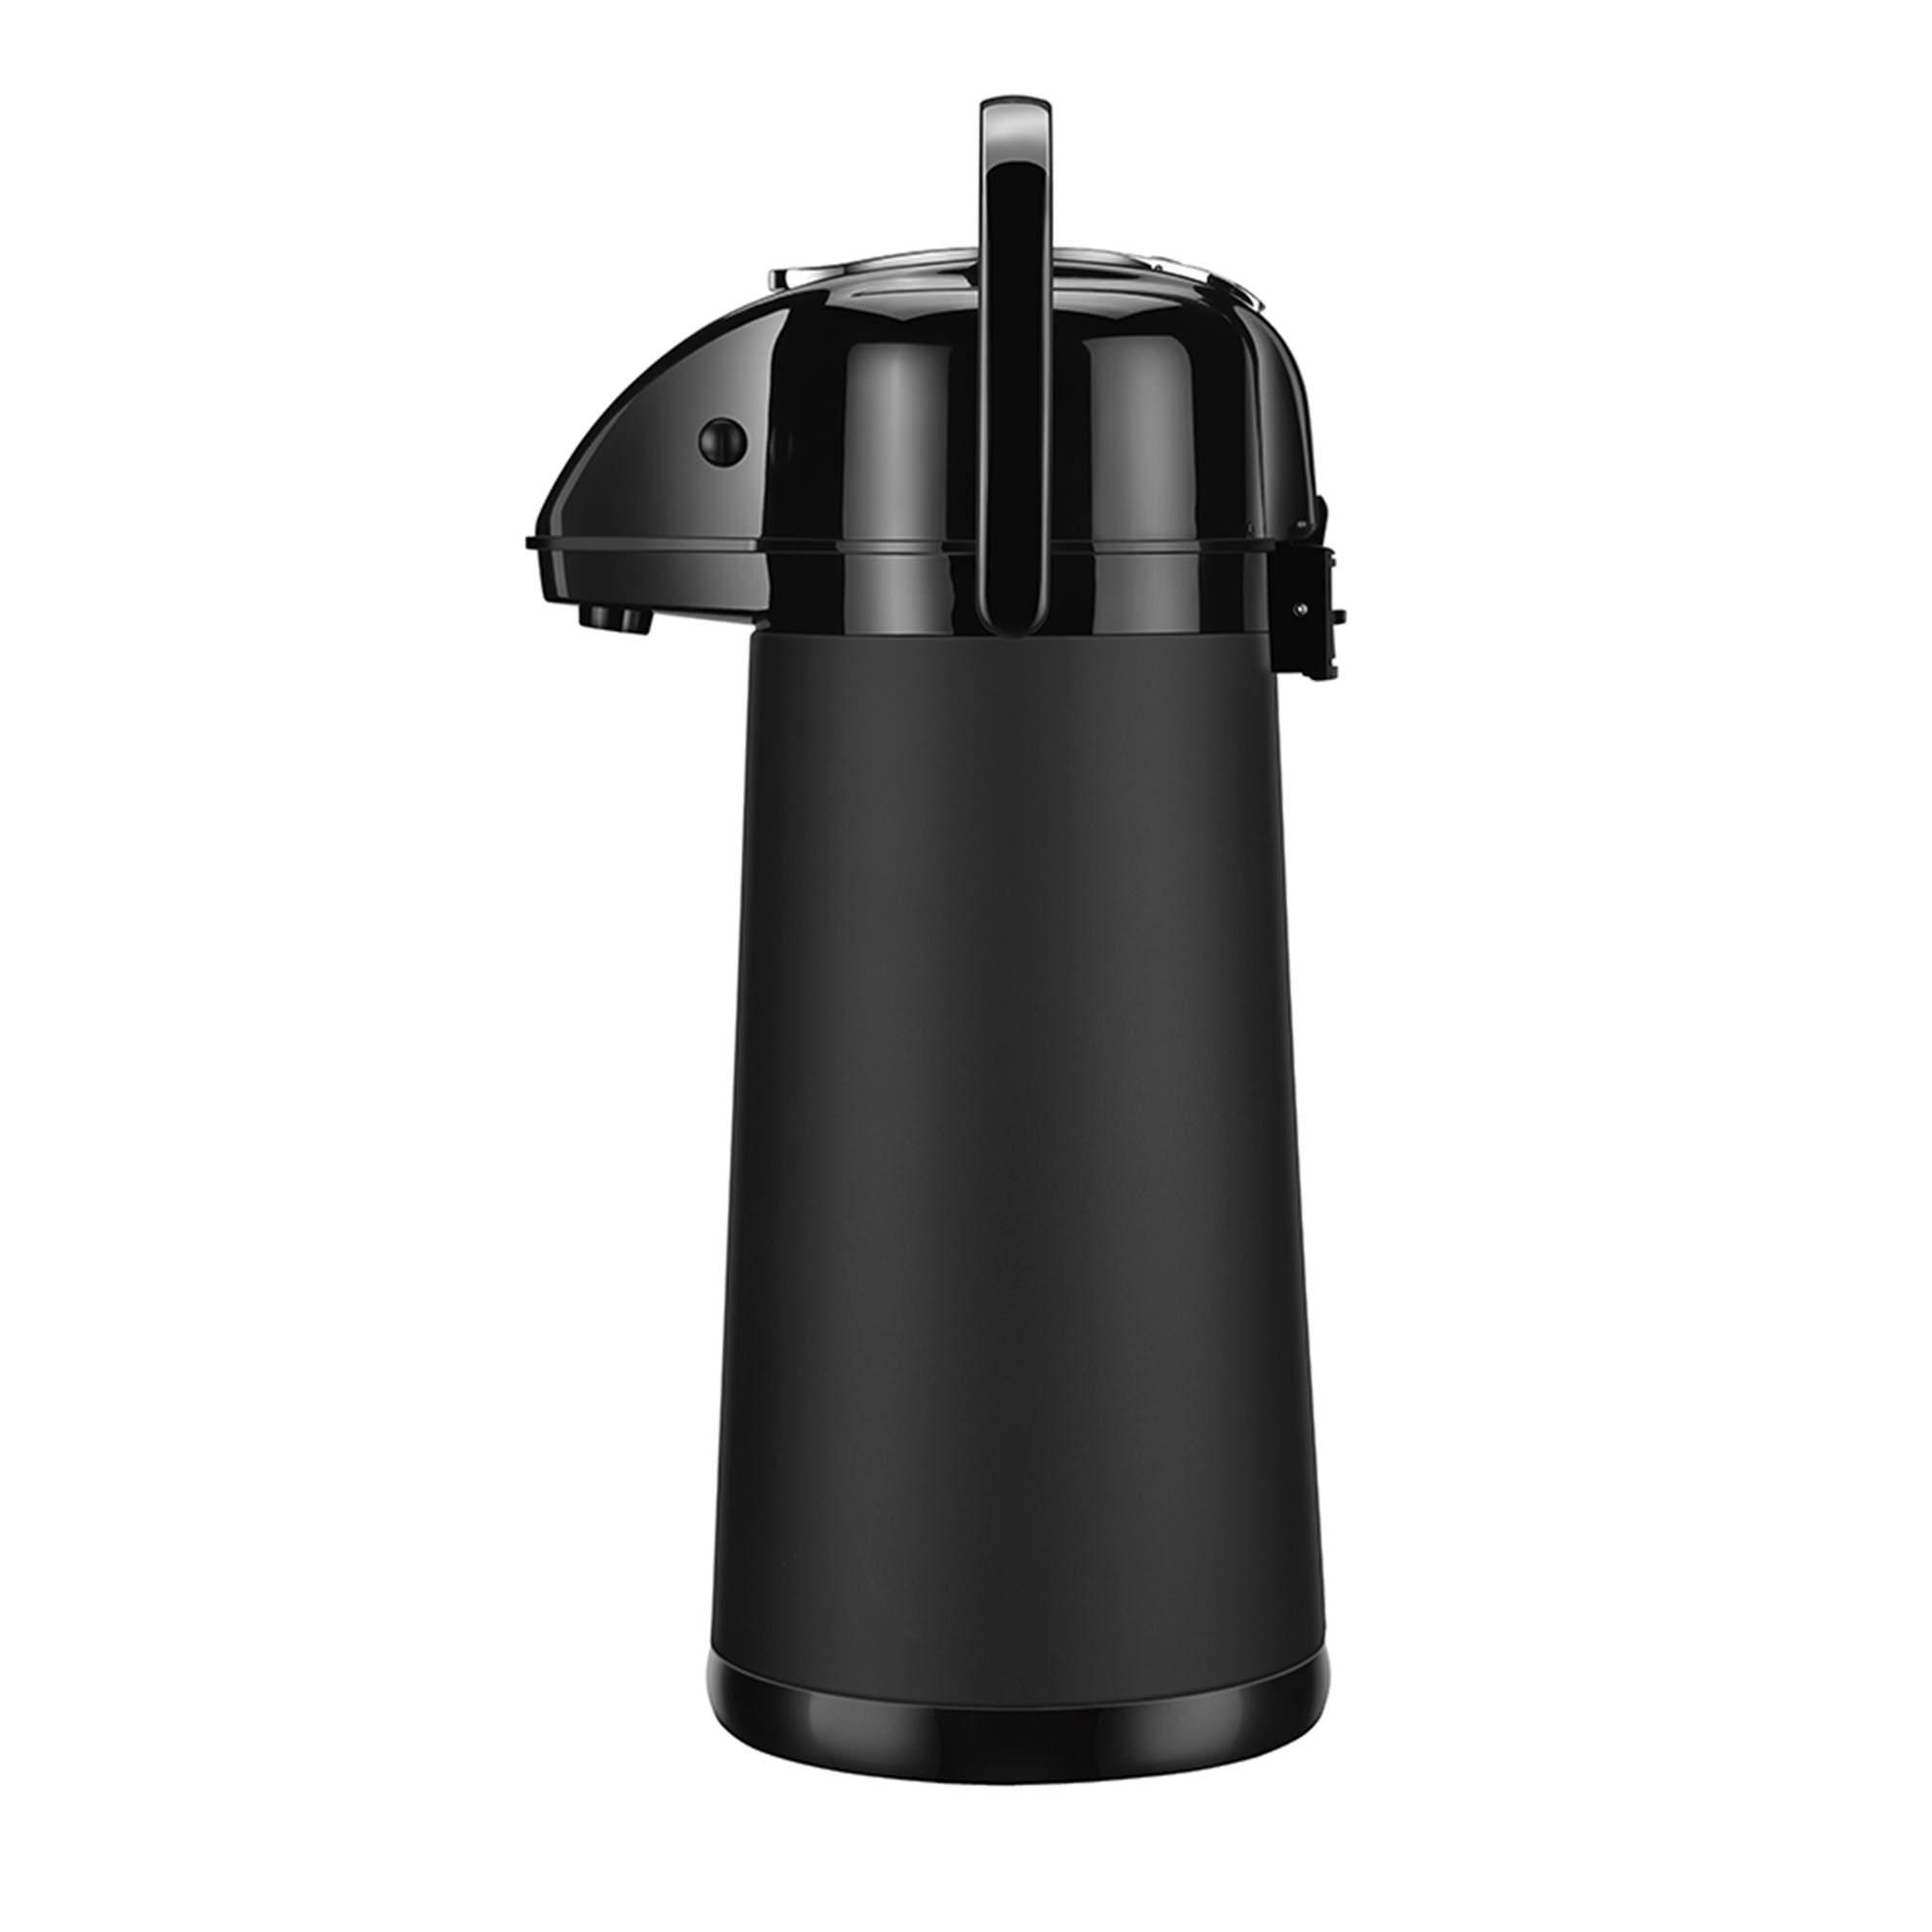 Garrafa Térmica Airpot Push-Button 2,2L Invicta